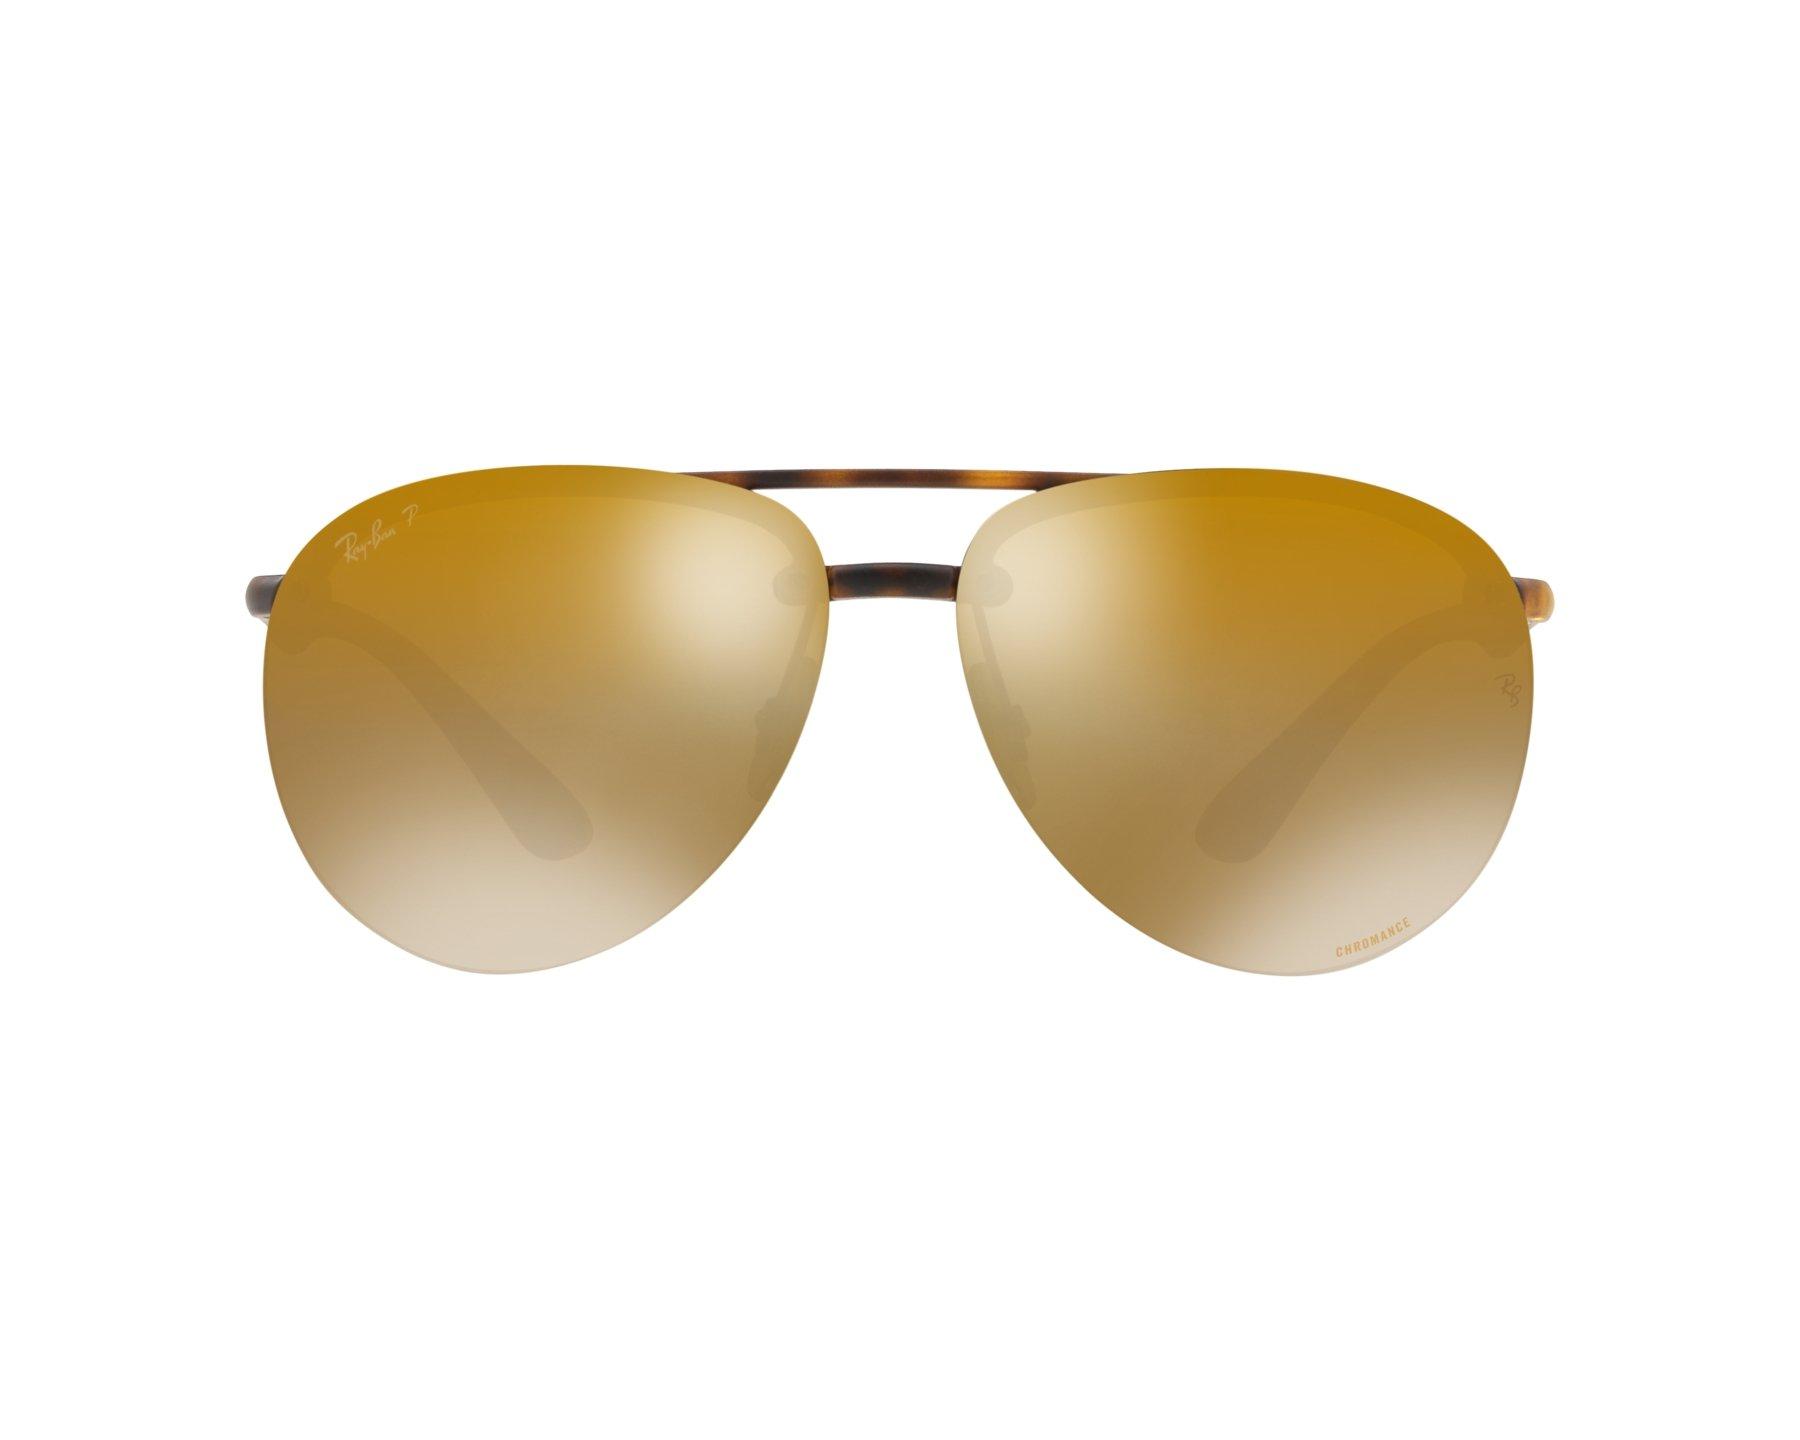 6f2795ea61 thumbnail Sunglasses Ray-Ban RB-4293-CH 894 A3 64-13